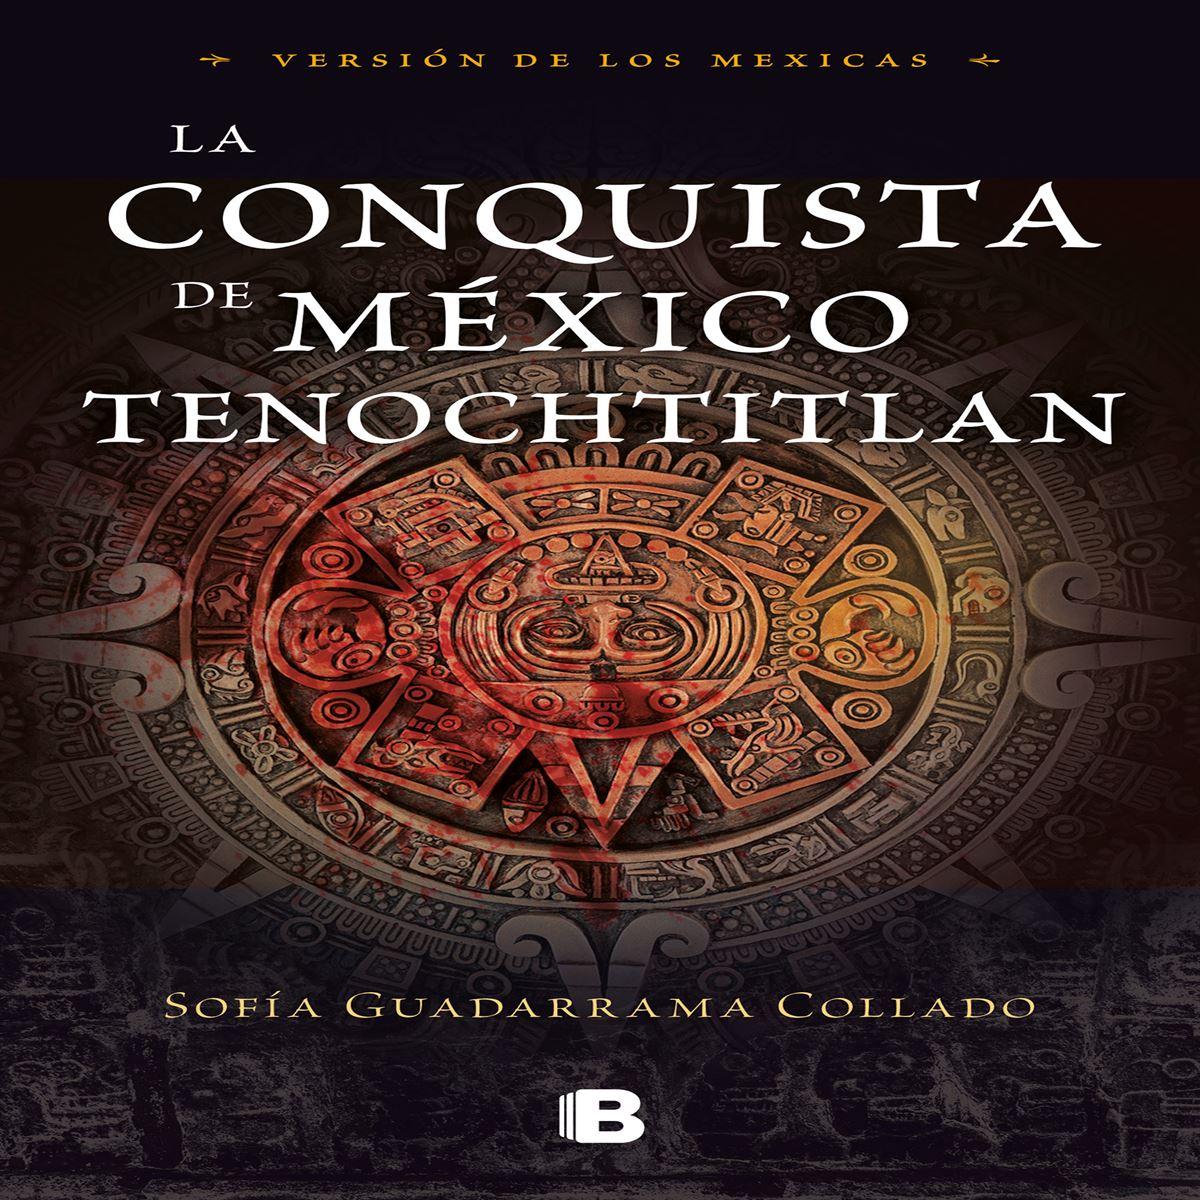 La conquista de México Tenochtitlan